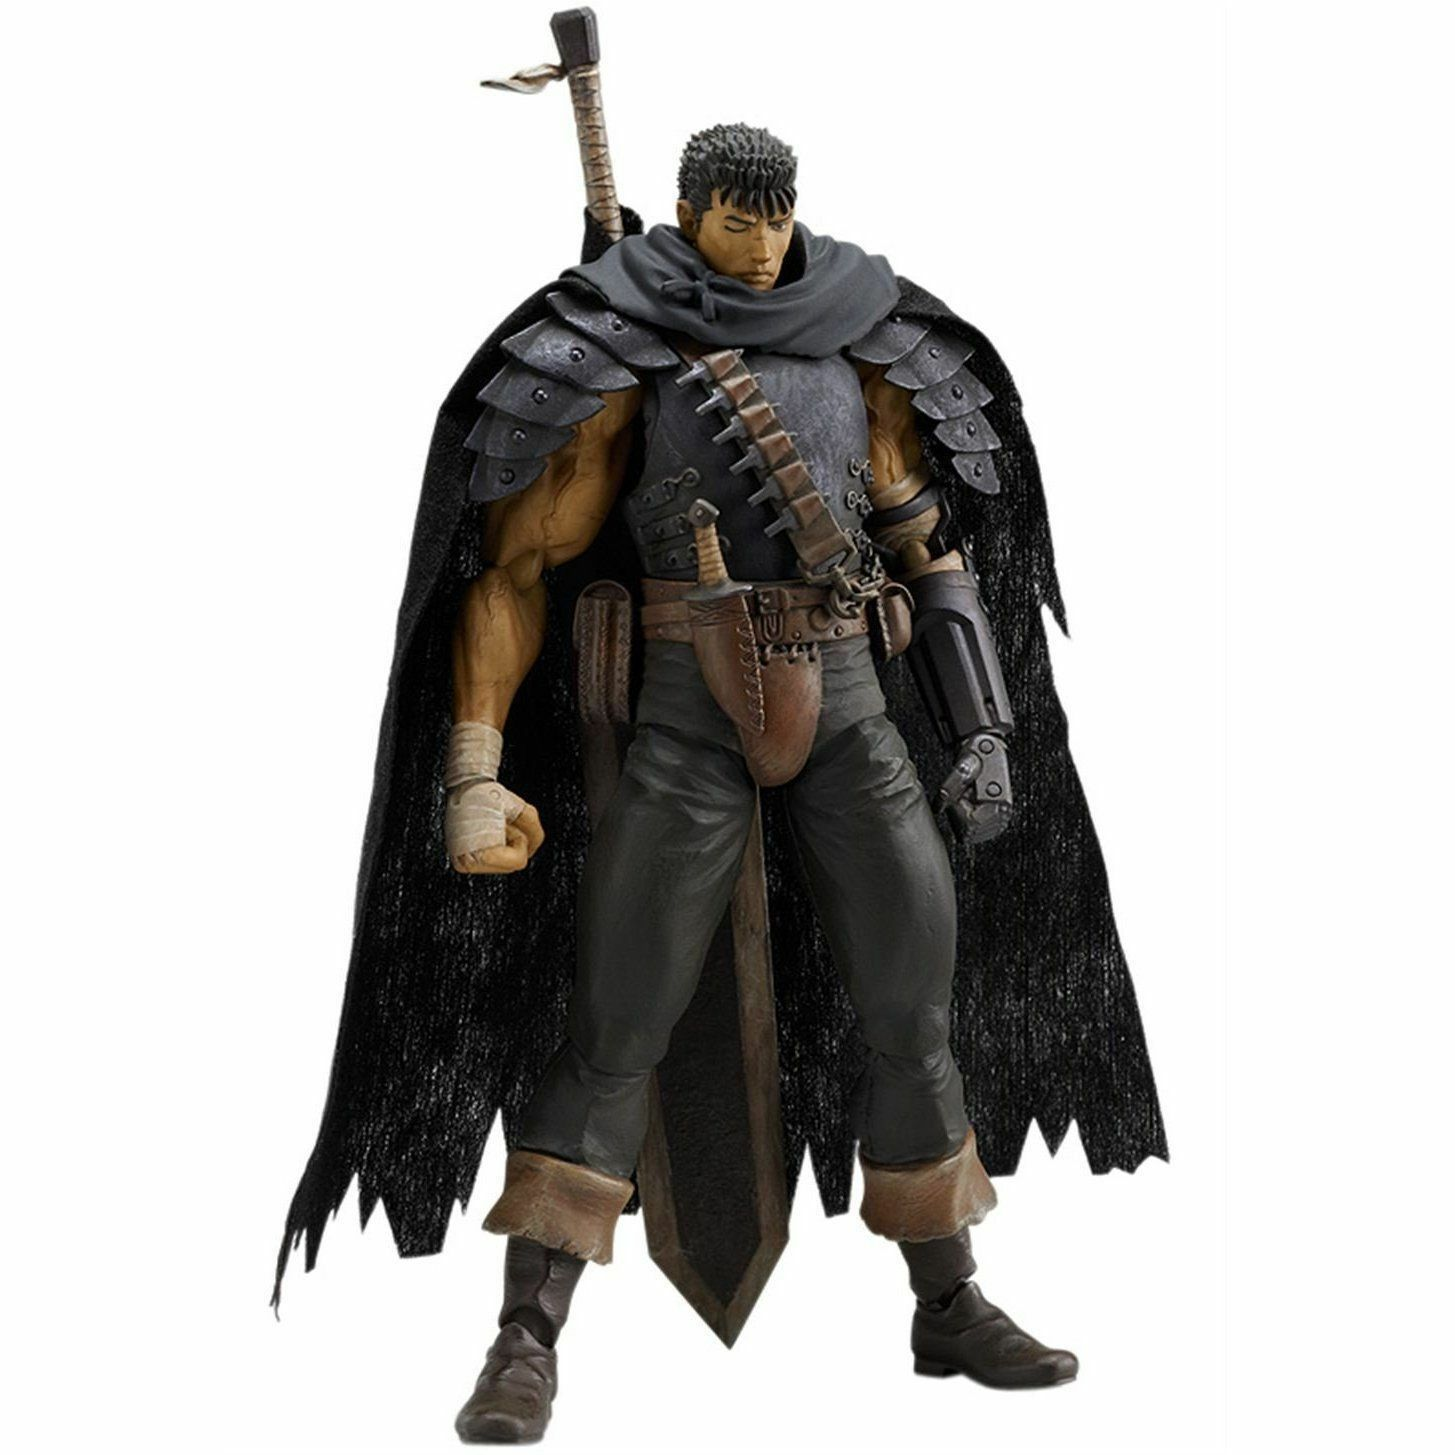 Figma 120 Berserk  Guts Noir soldat Ver. Figure Max Factory from JAPAN  vente avec grande remise